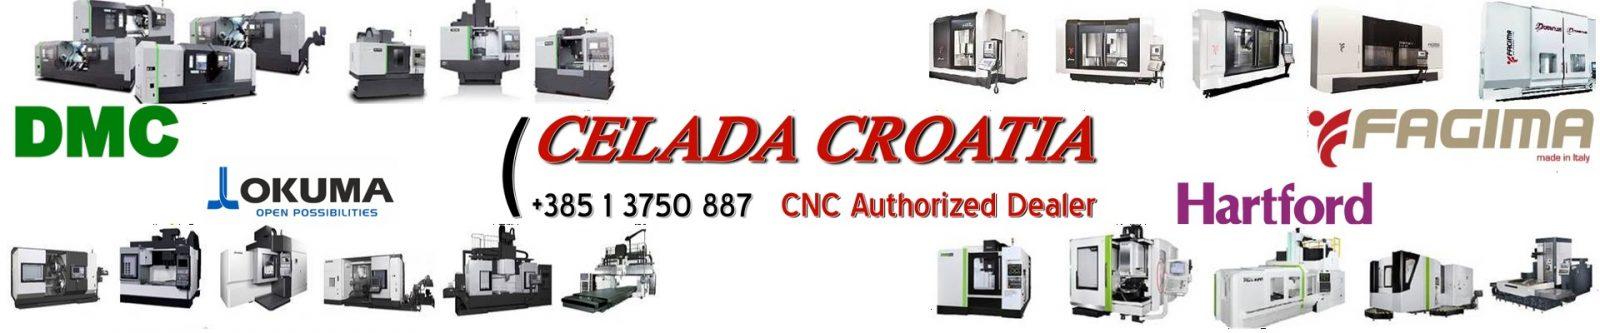 CELADA CROATIA LOGO WITH TEL HEADER